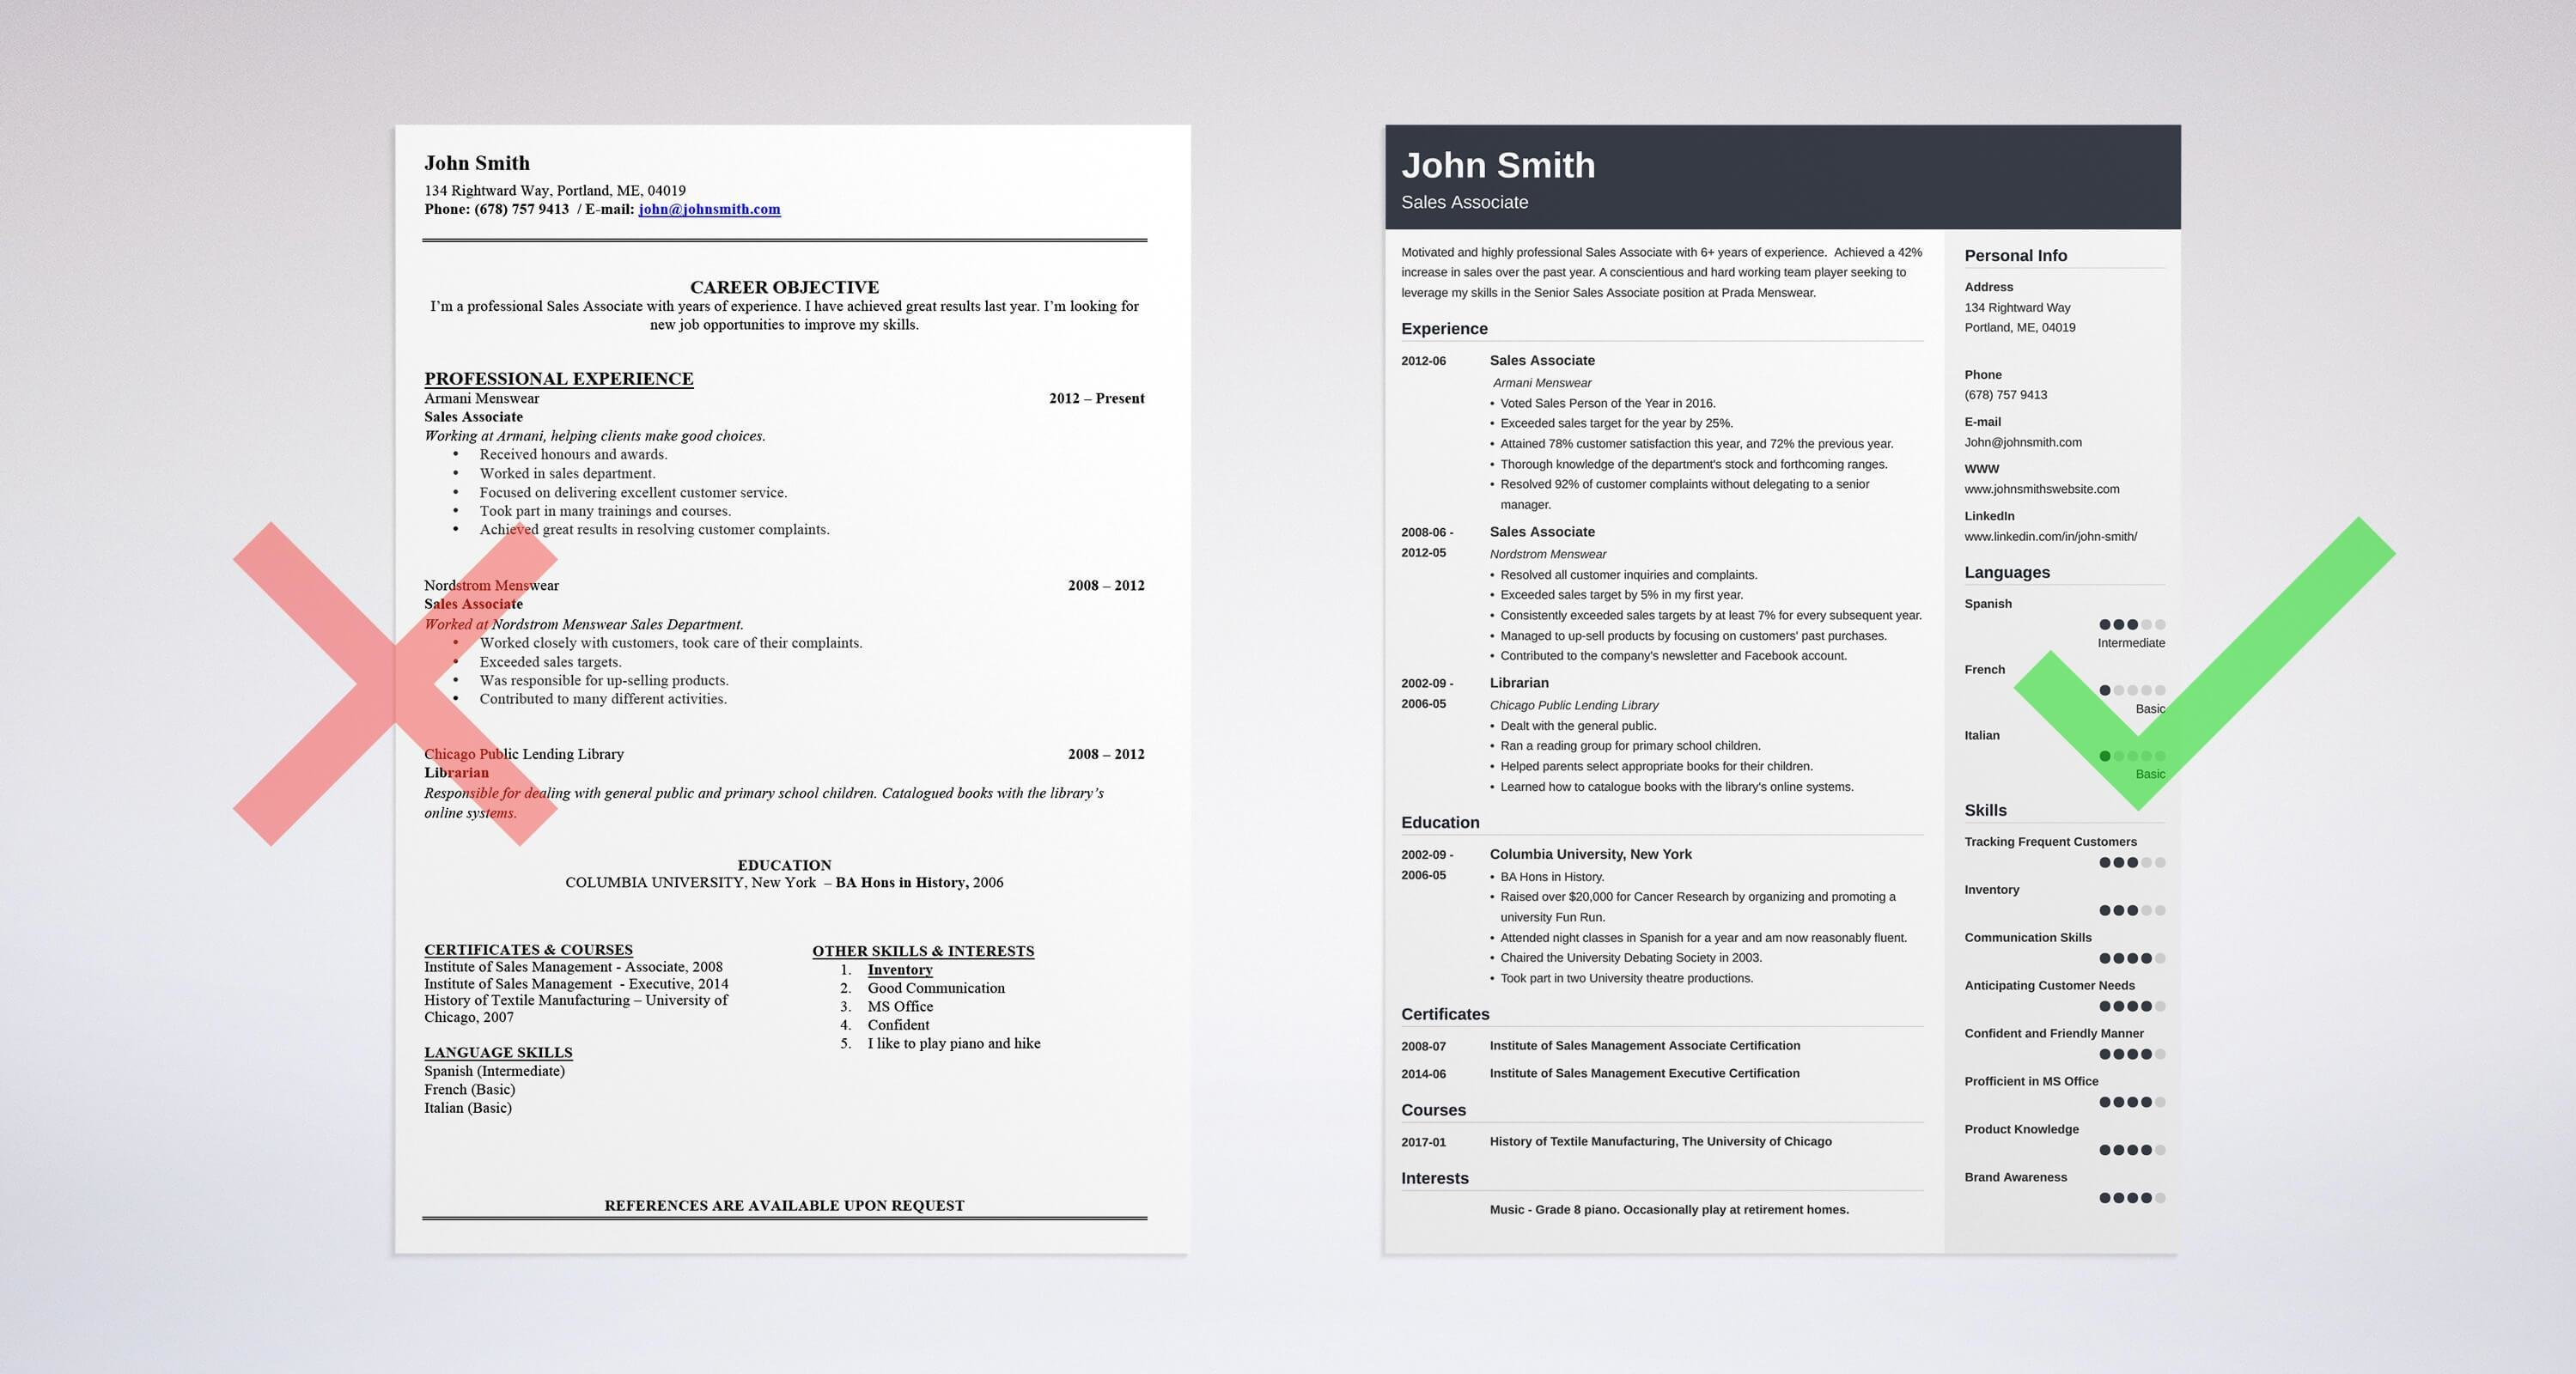 Resume Summary Examples 30 Professional Summary Statements